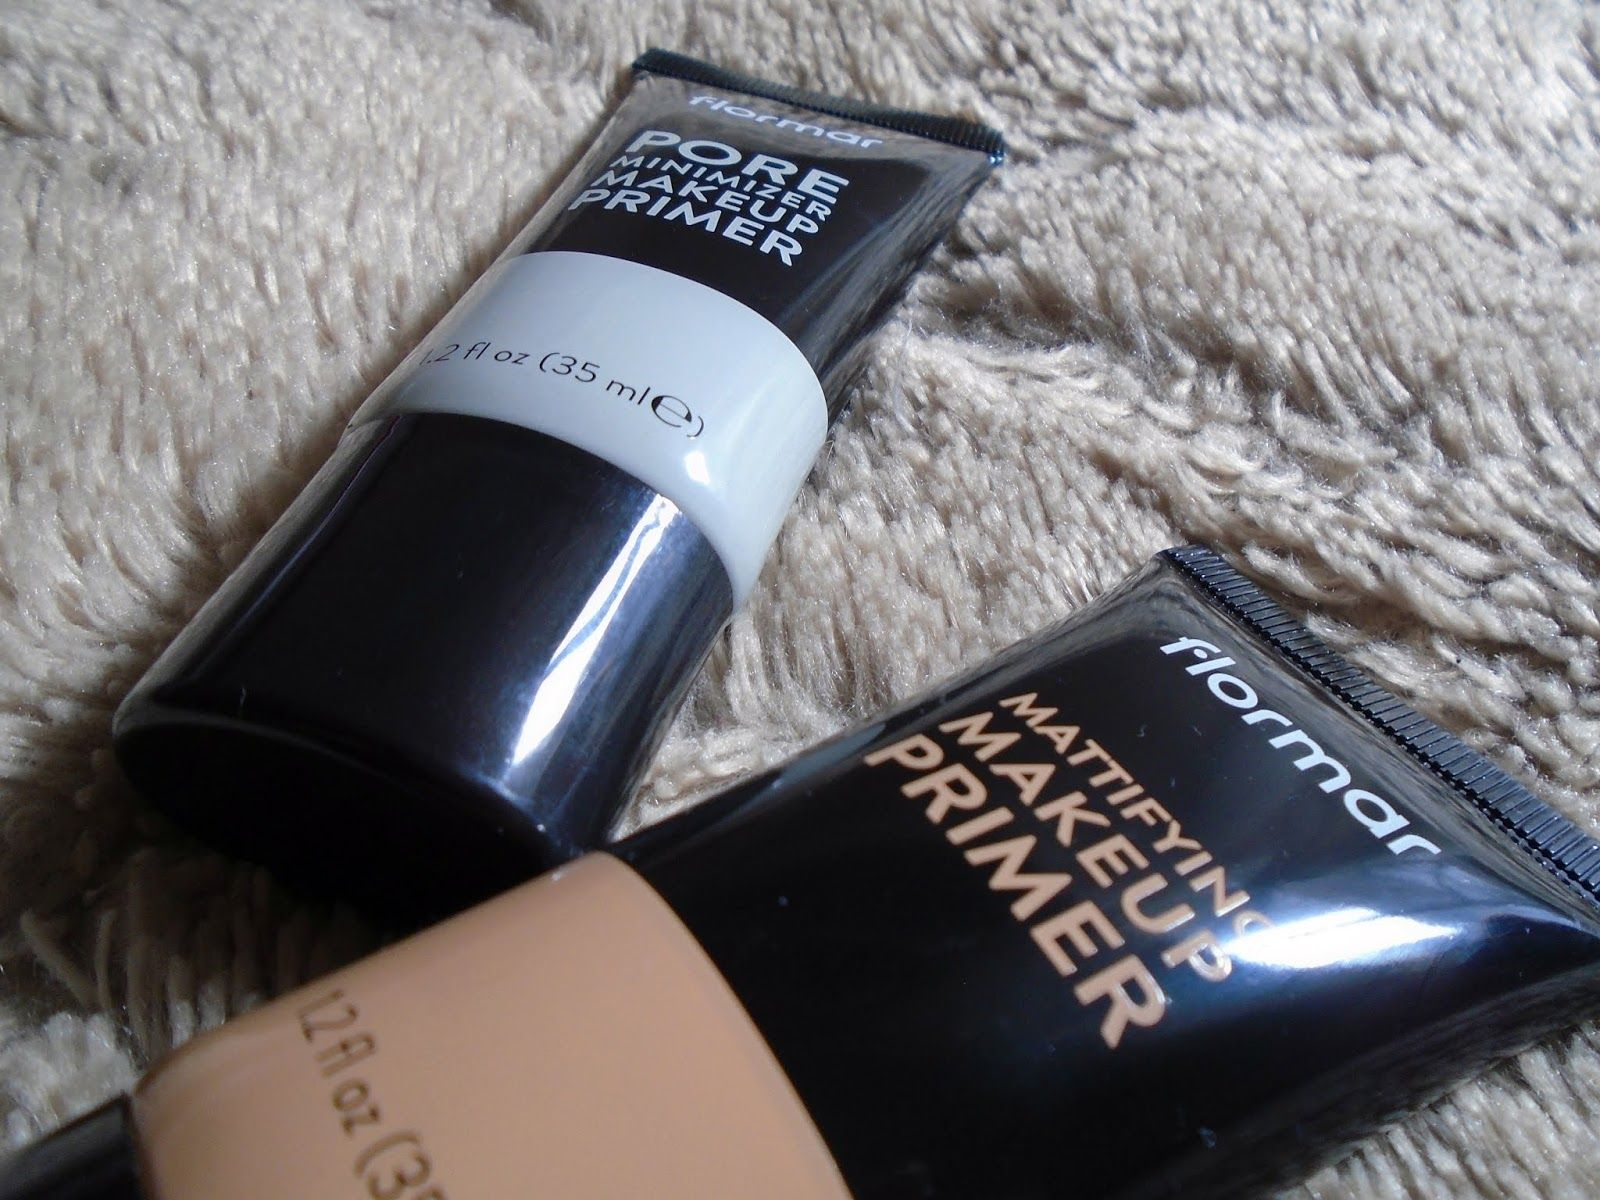 Flormar Mattifying Makeup Primer Pore Minimizer Primer Review